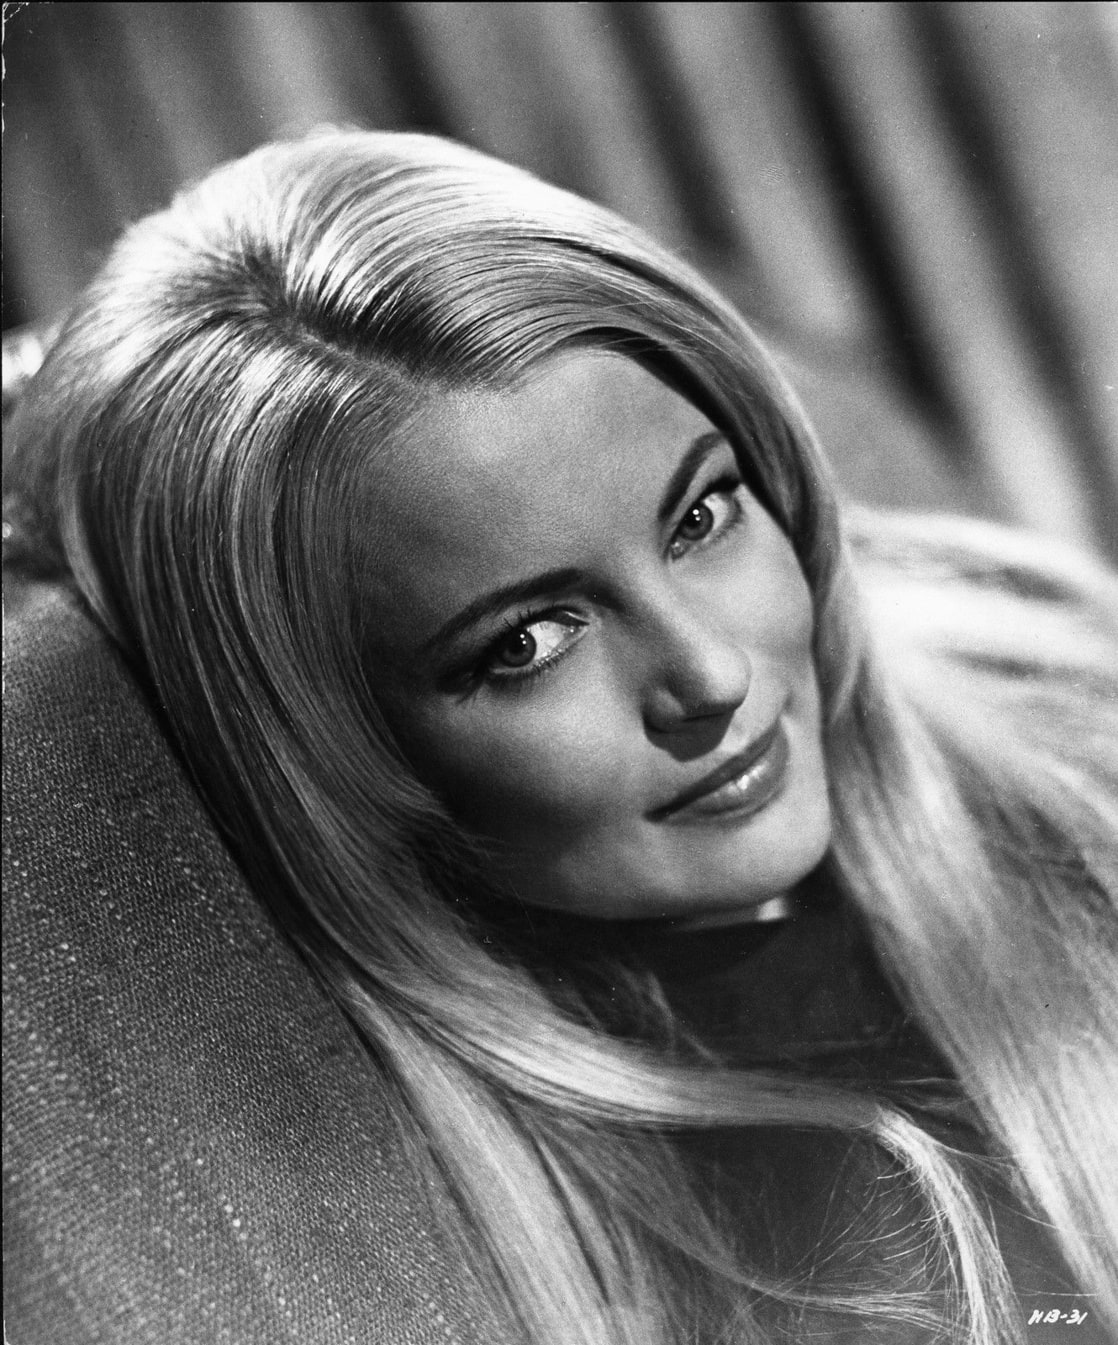 Tessie Agana (b. 1943),Kara Brock XXX photos Martha Madison,Andrew Lincoln (born 1973)